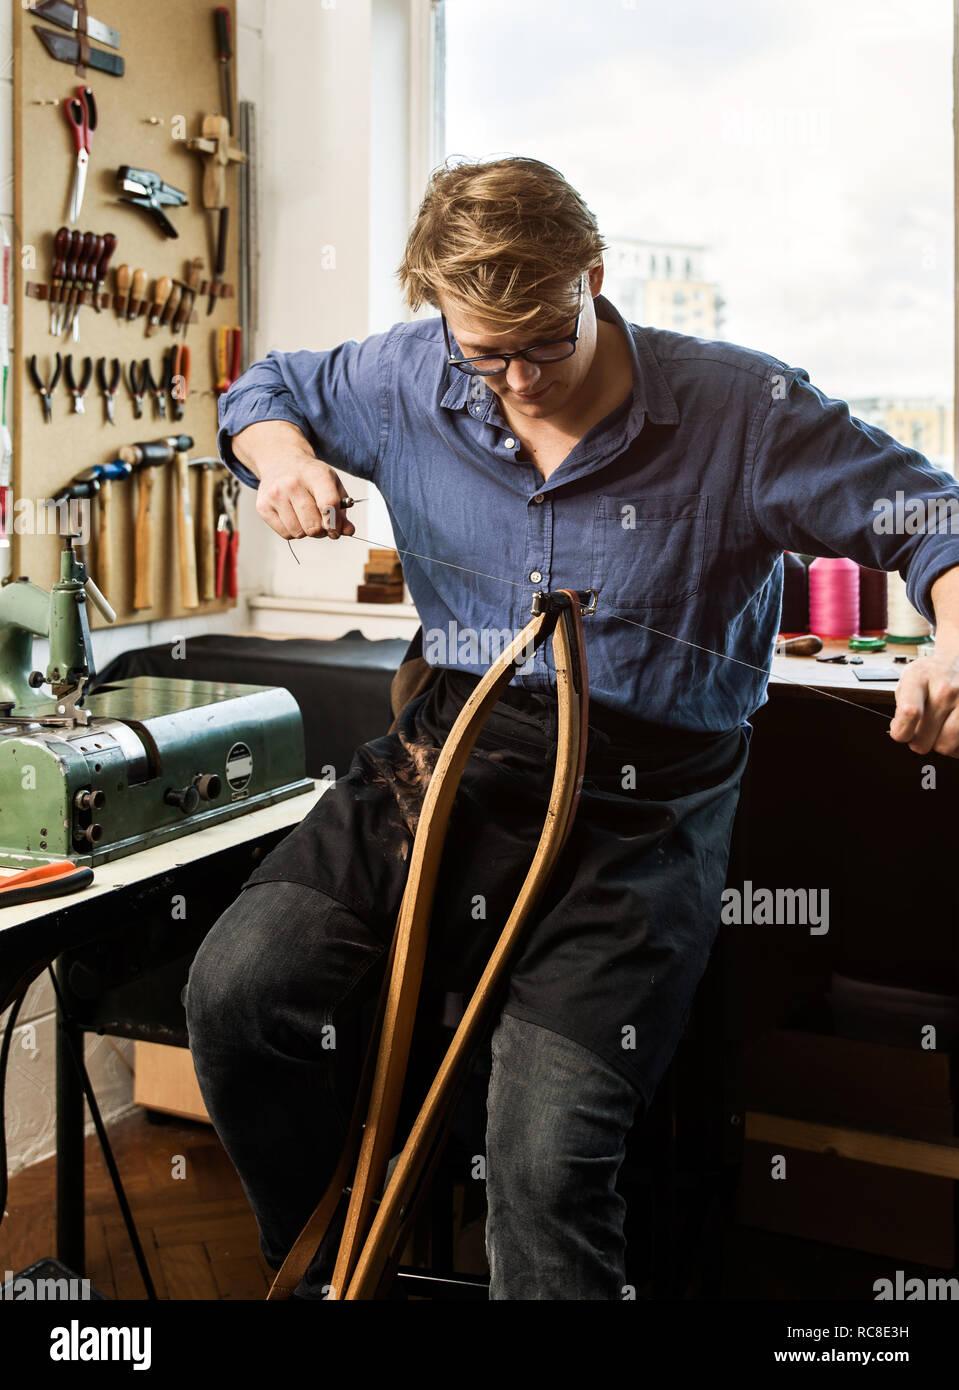 Leatherworker stitching leather handbag straps in workshop Stock Photo